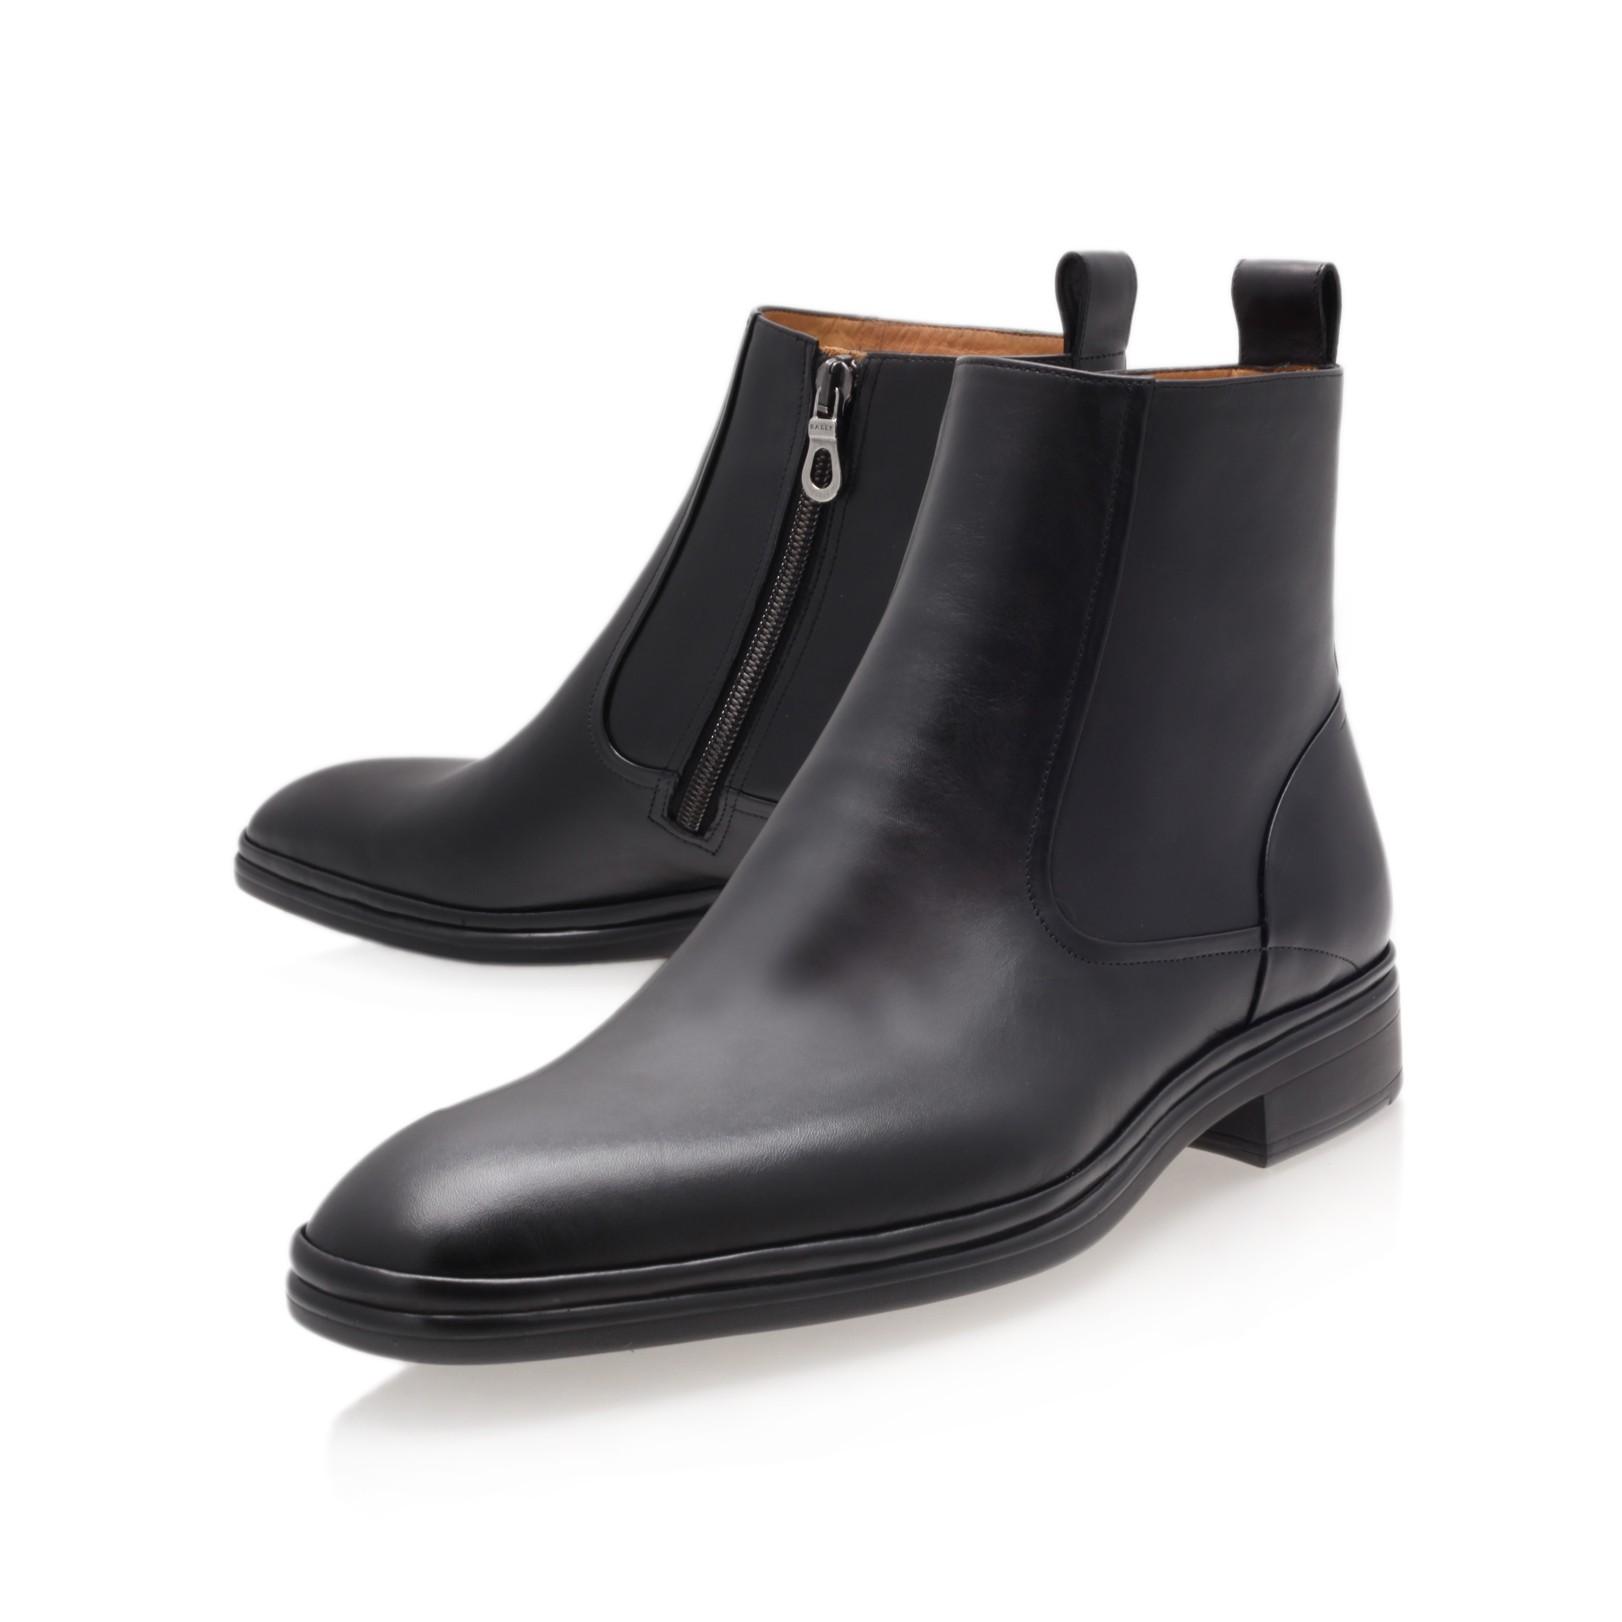 Bally Newsome Rs Zip Chelsea In Black For Men